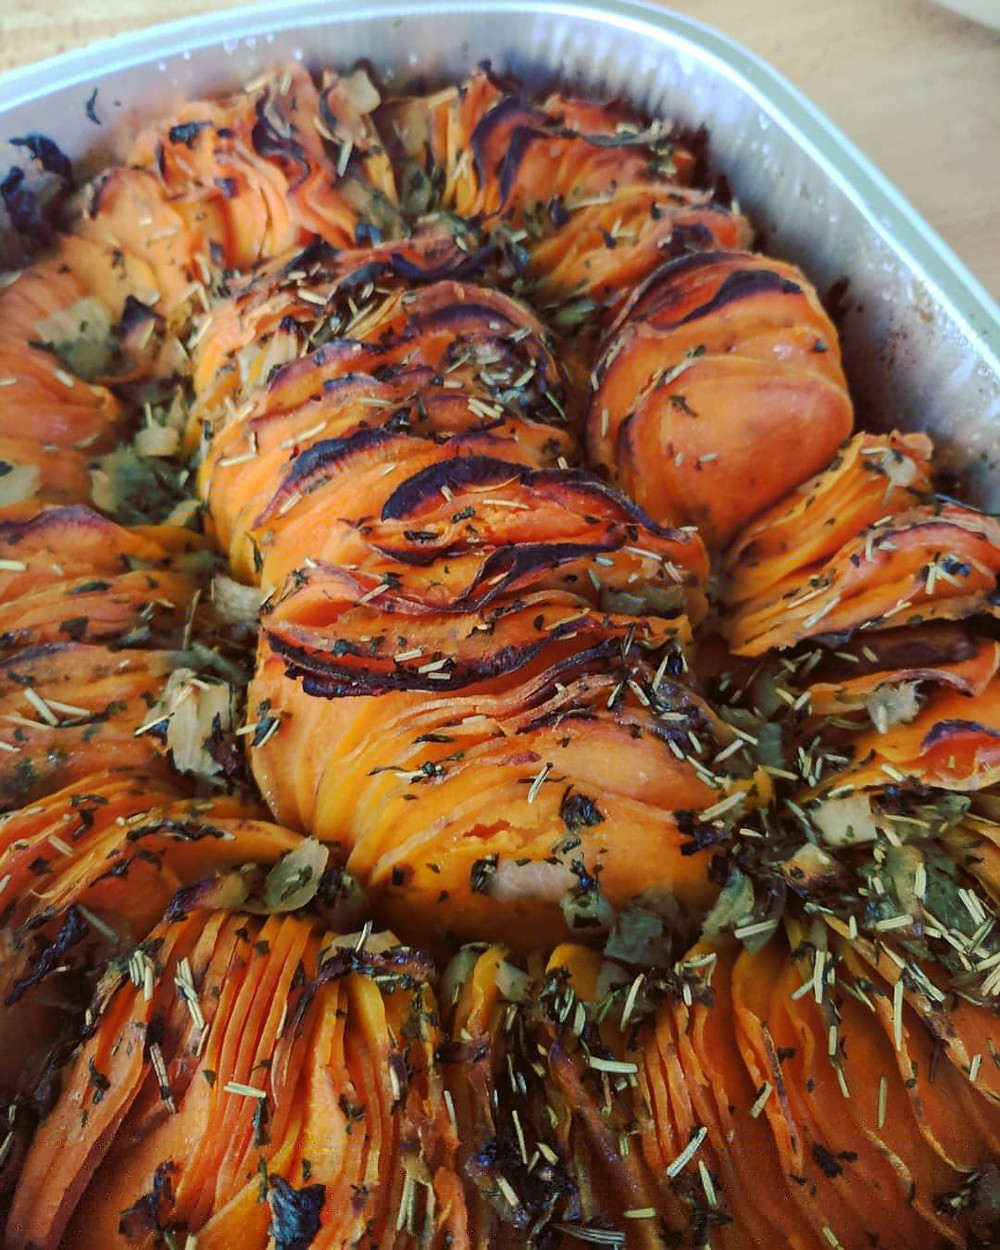 Shingled Rosemary Sweet Potatoes - Food Allergy-Friendly Thanksgiving - Amanda MacGregor - Food Allergy recipes - centineo